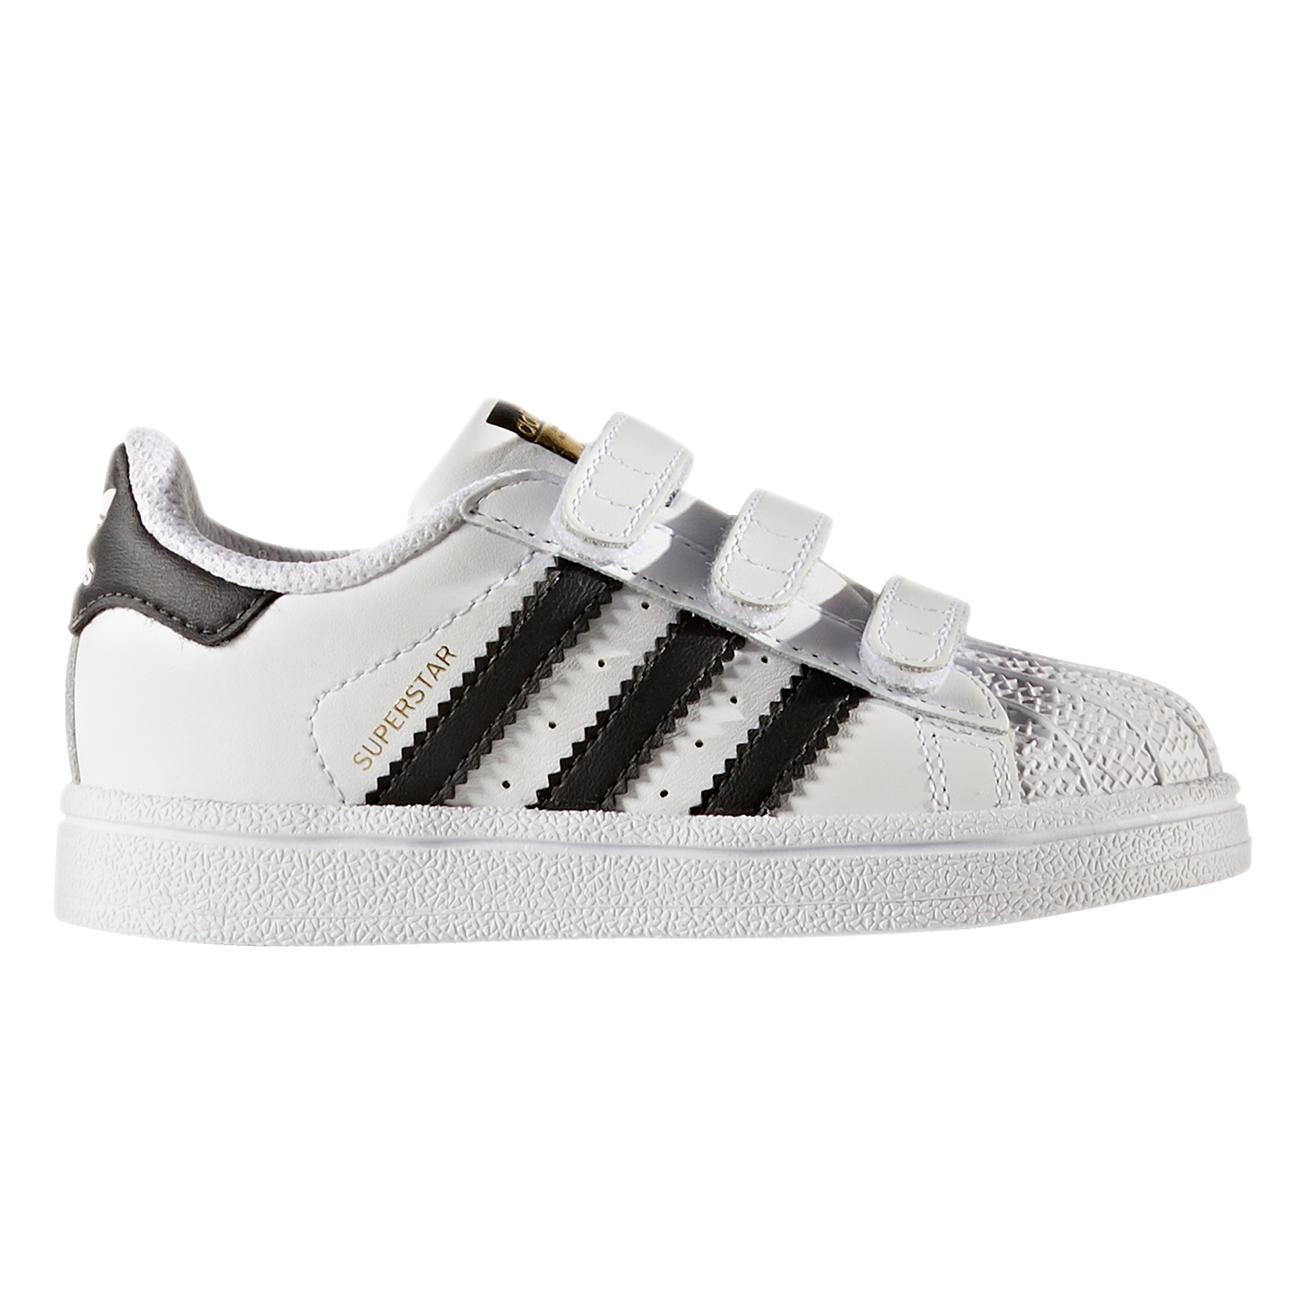 12596bdf3 adidas Superstar Sneakers White/Black